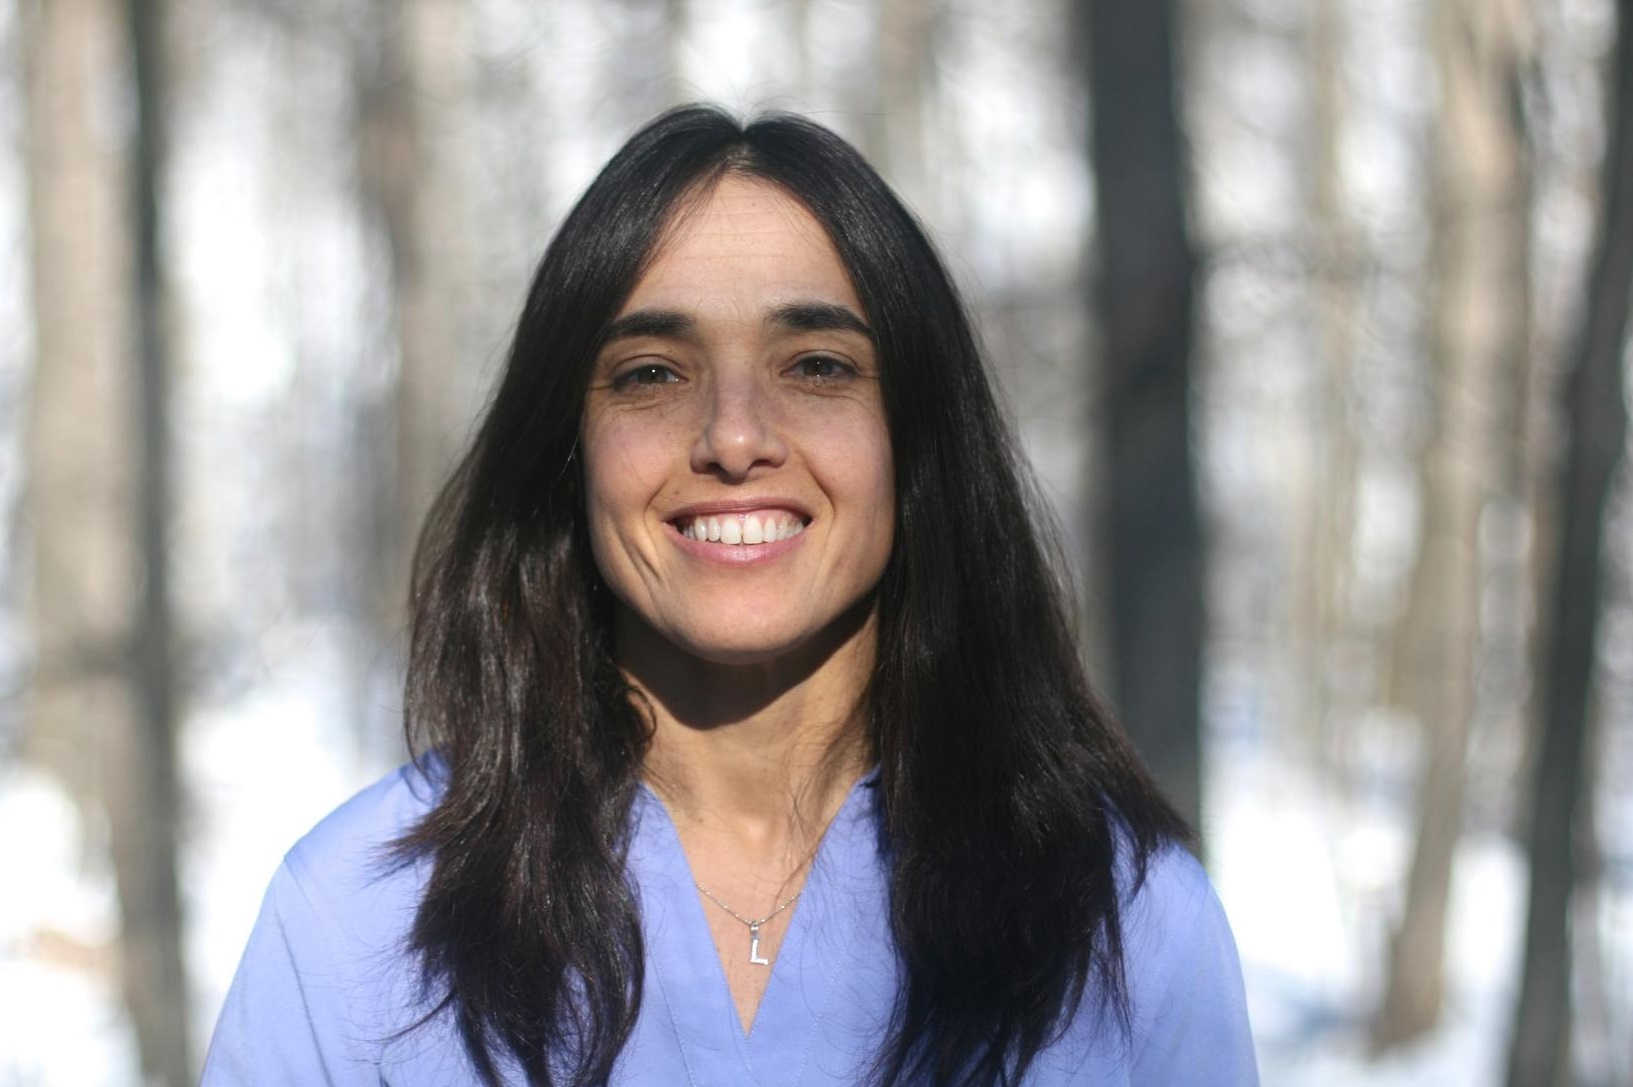 STI CEO Louise Twining-Ward